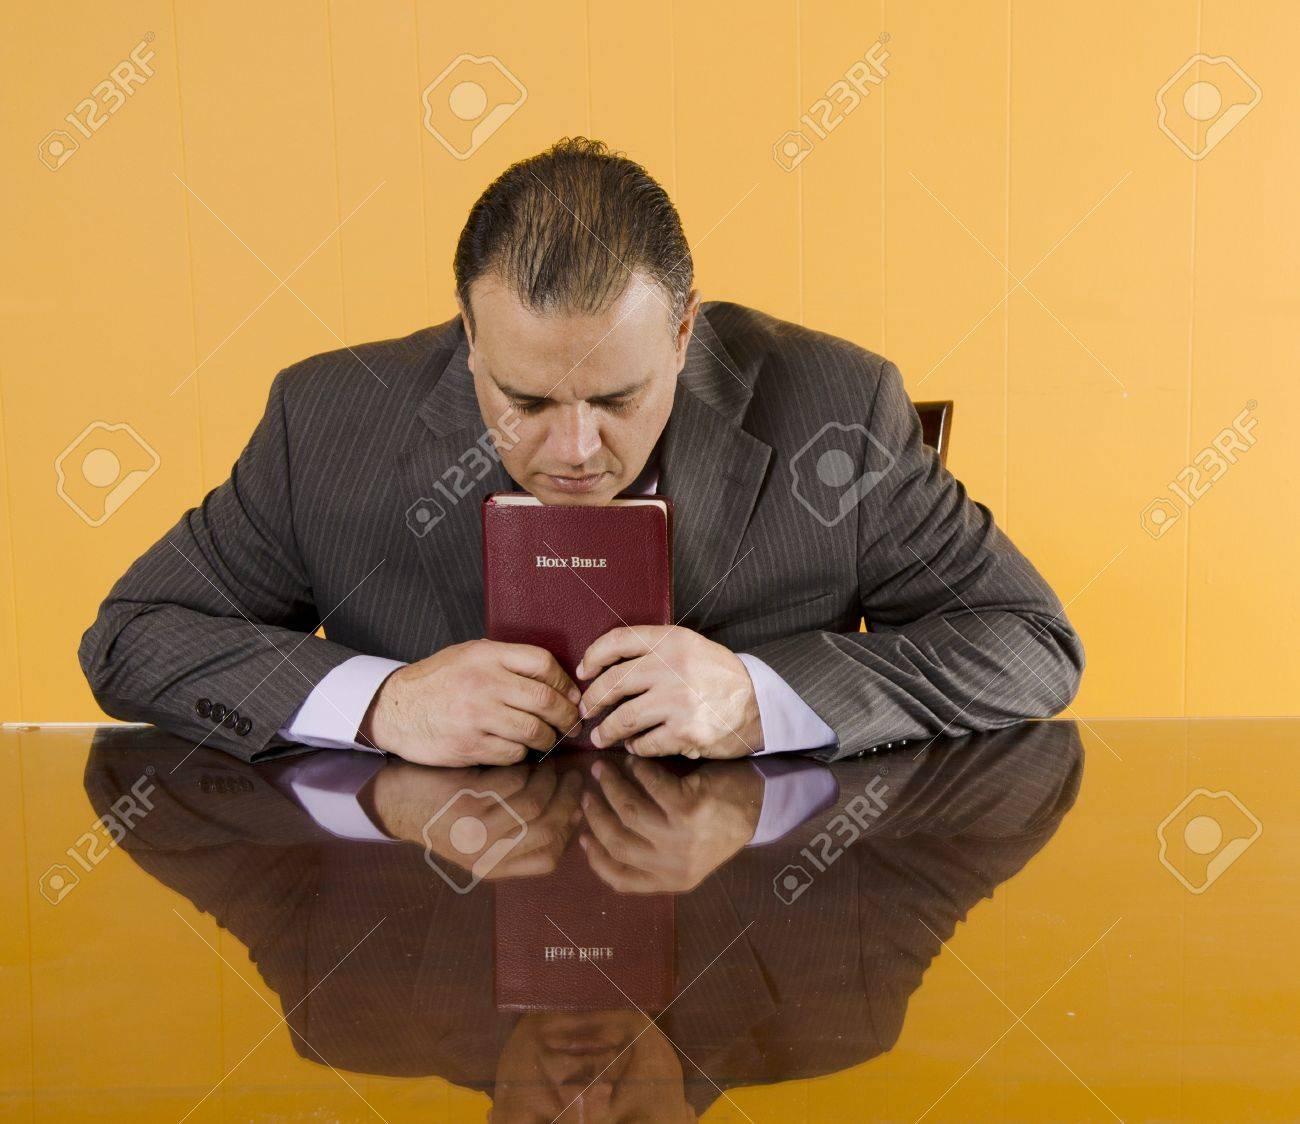 Daily devotional of a Hispanic business man Stock Photo - 13296904